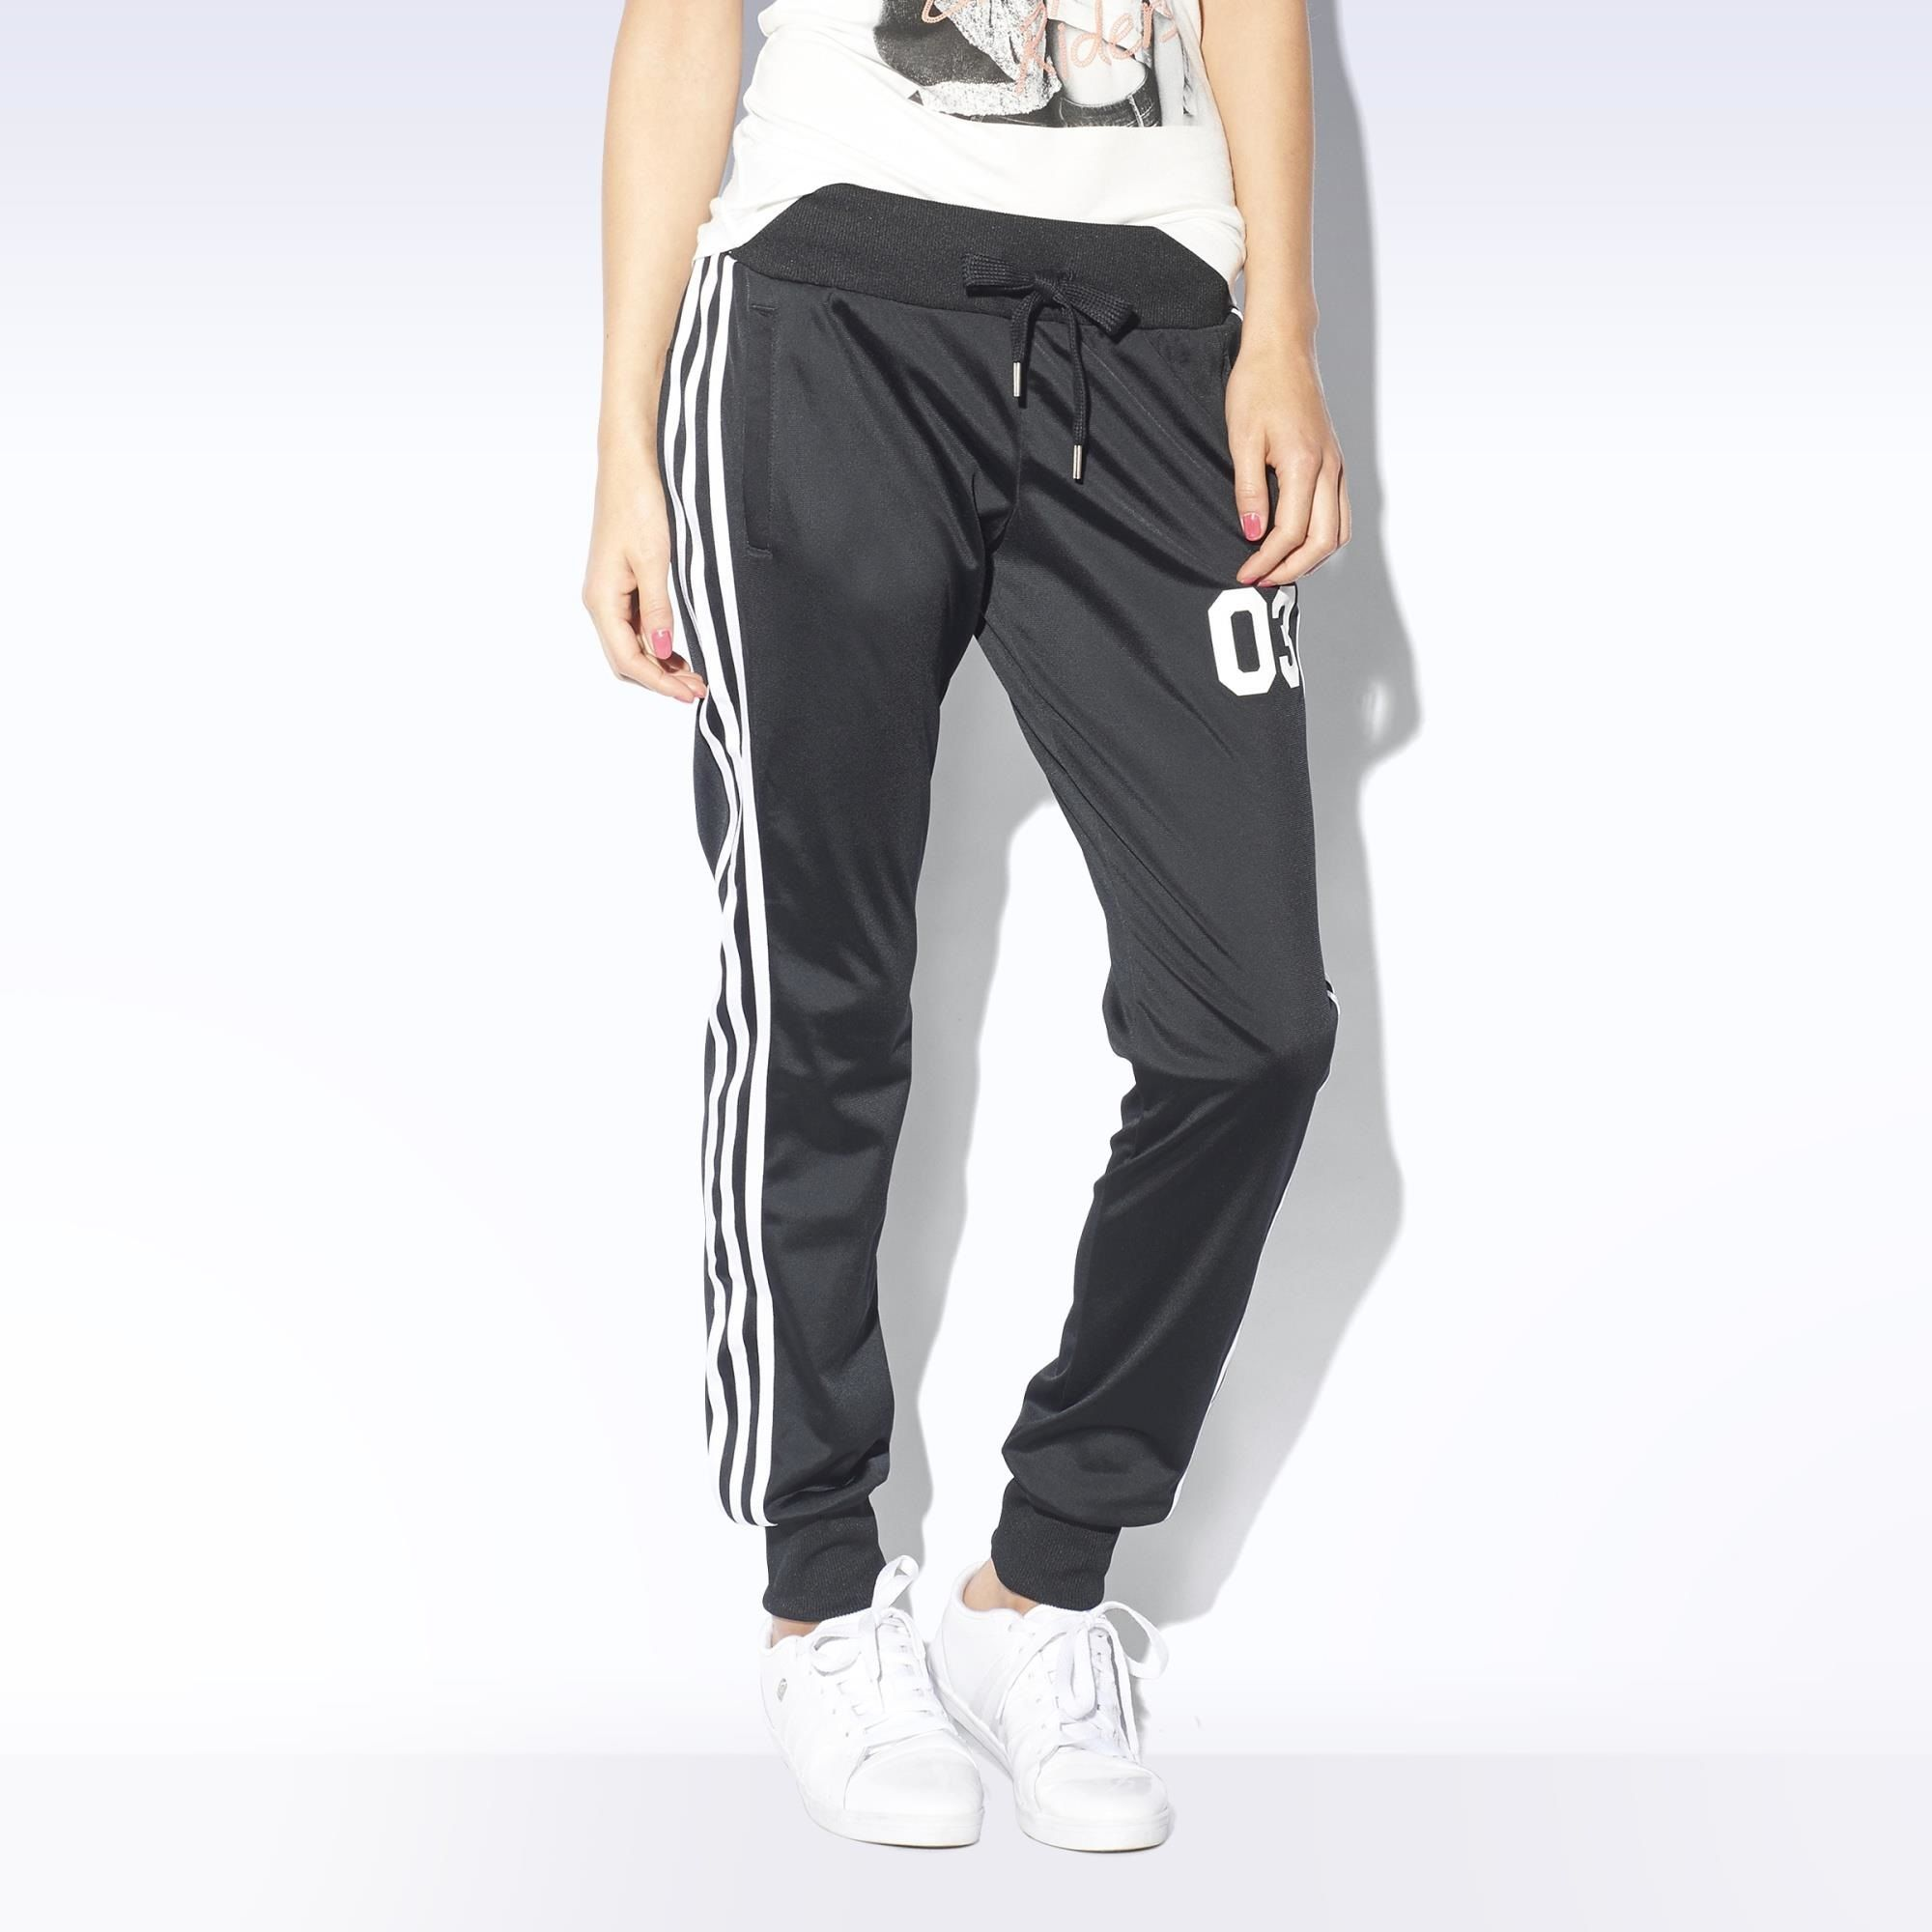 adidas - Pantalón de Buzo adidas Mujer  c18f622bdb2c